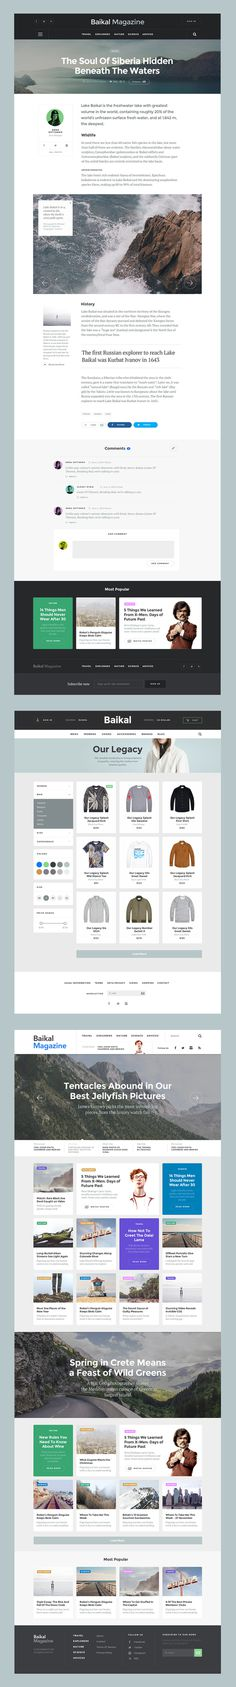 Basic Templates #ui #kit #web #design #website